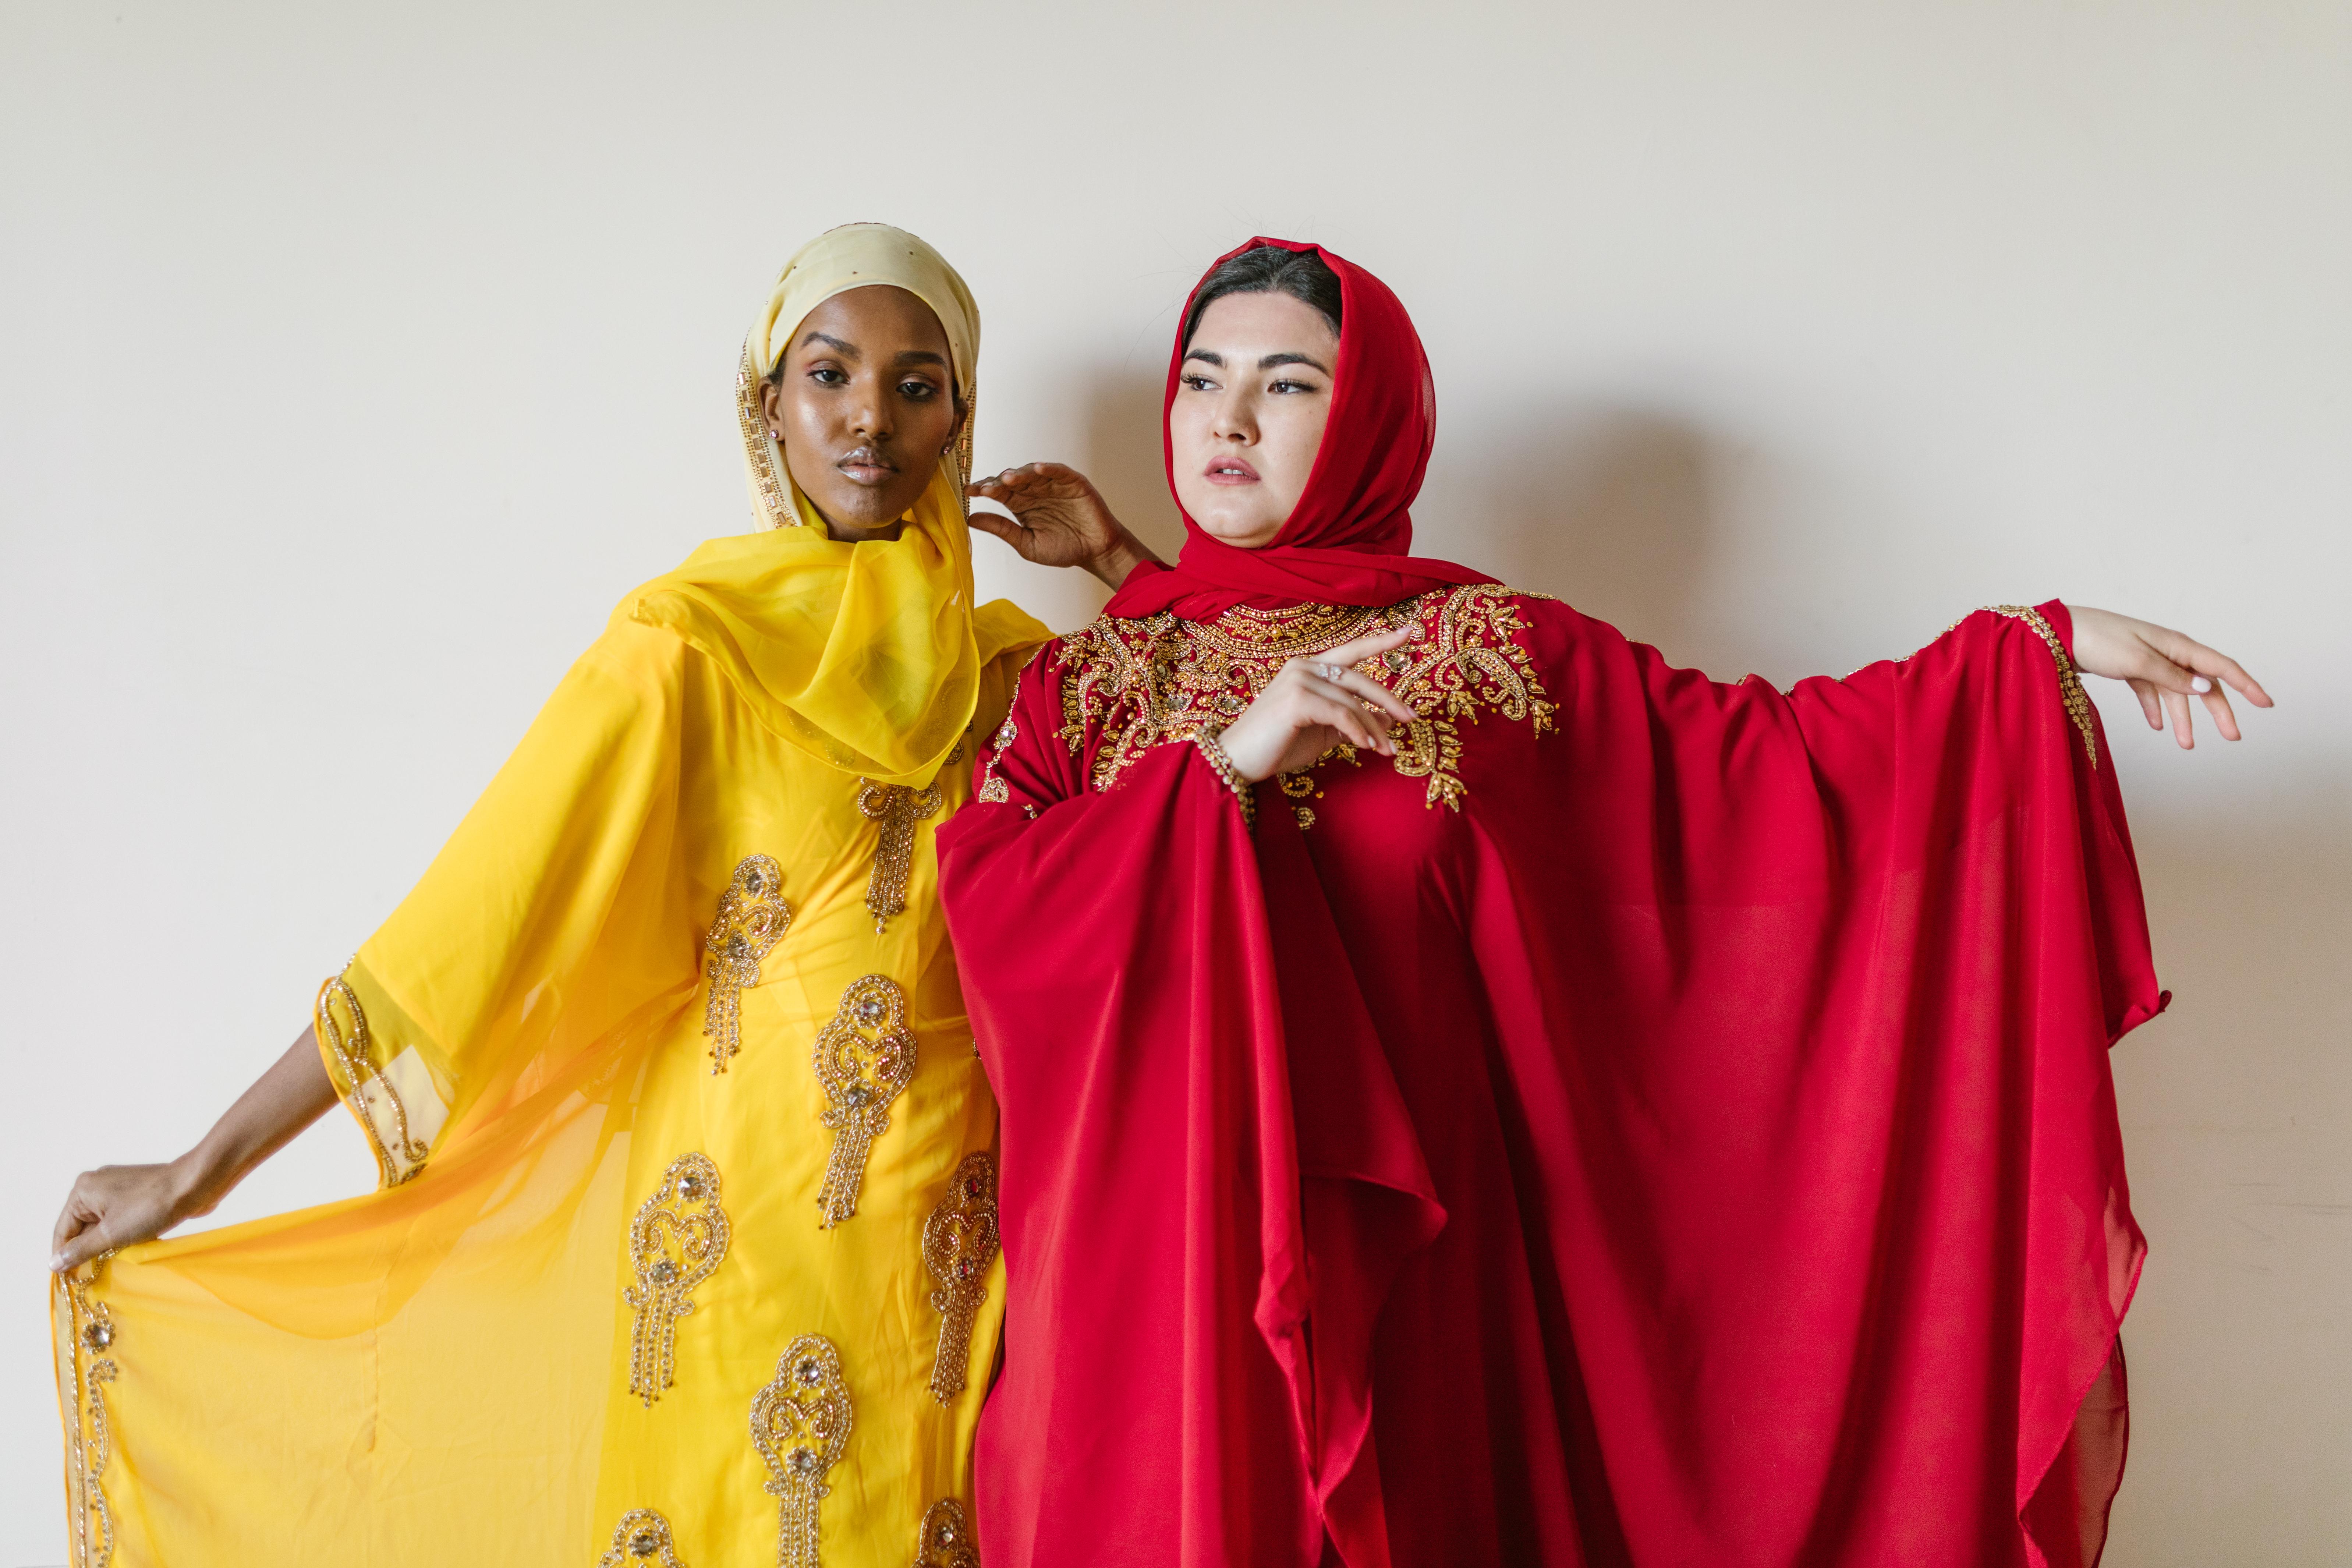 woman in yellow hijab and red abaya